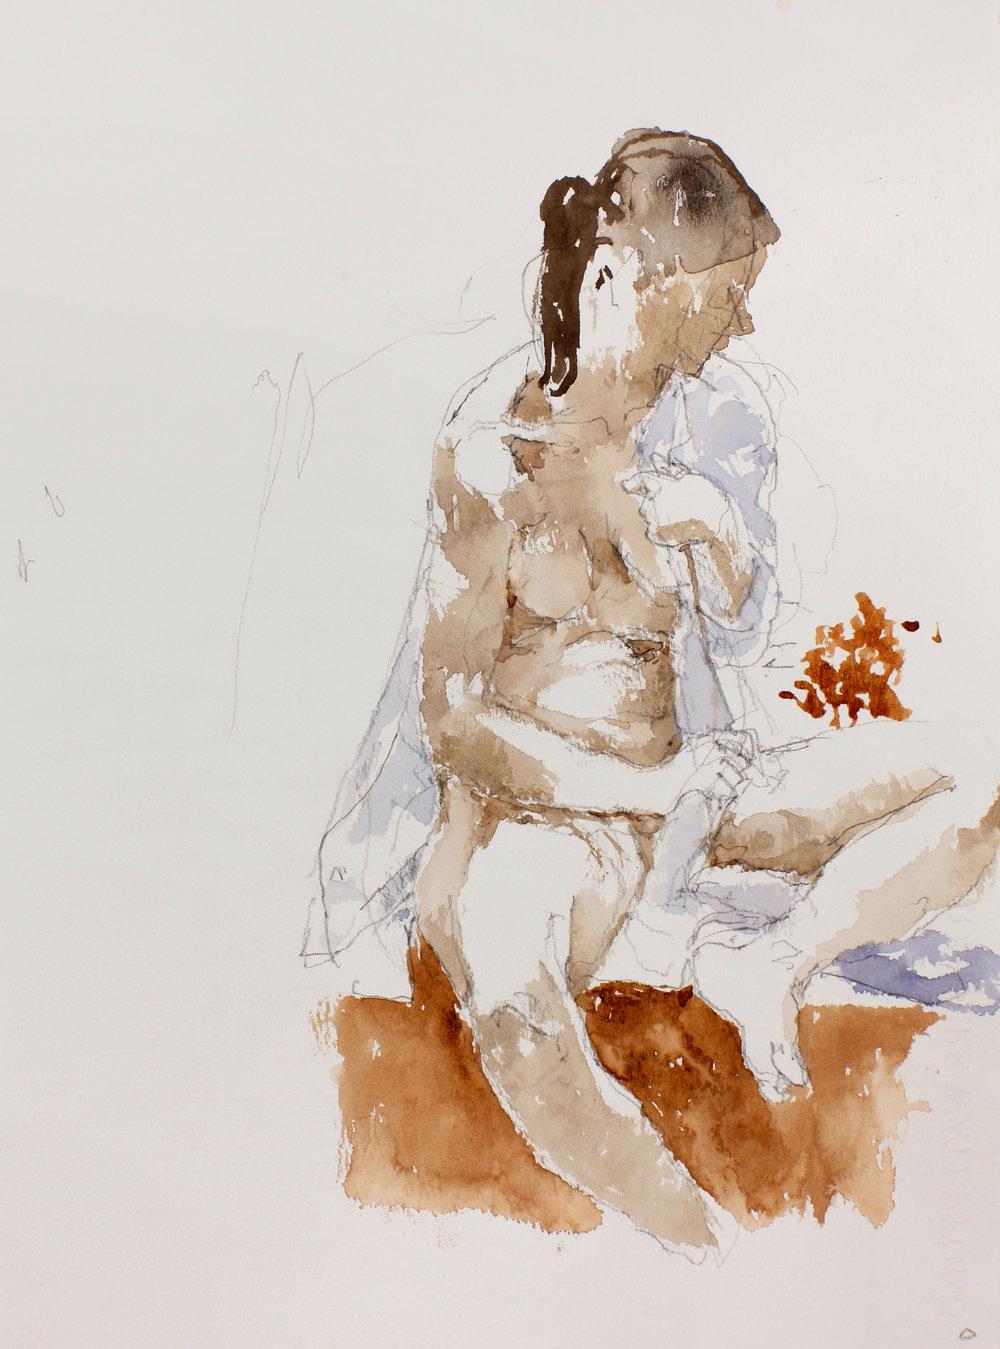 Seated Nude Adjusting Shirt